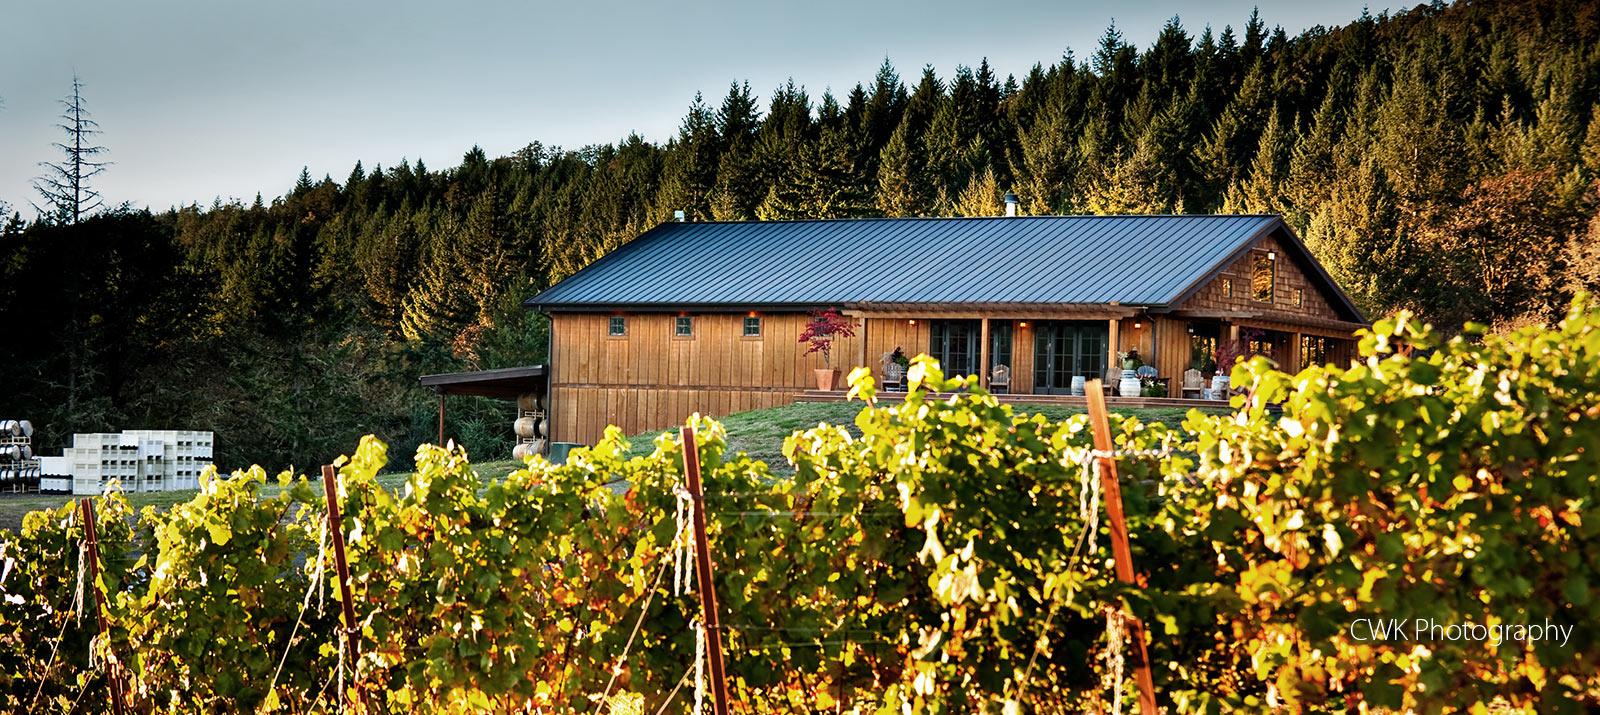 Coeur de Terre winery McMinnville Oregon wine tasting